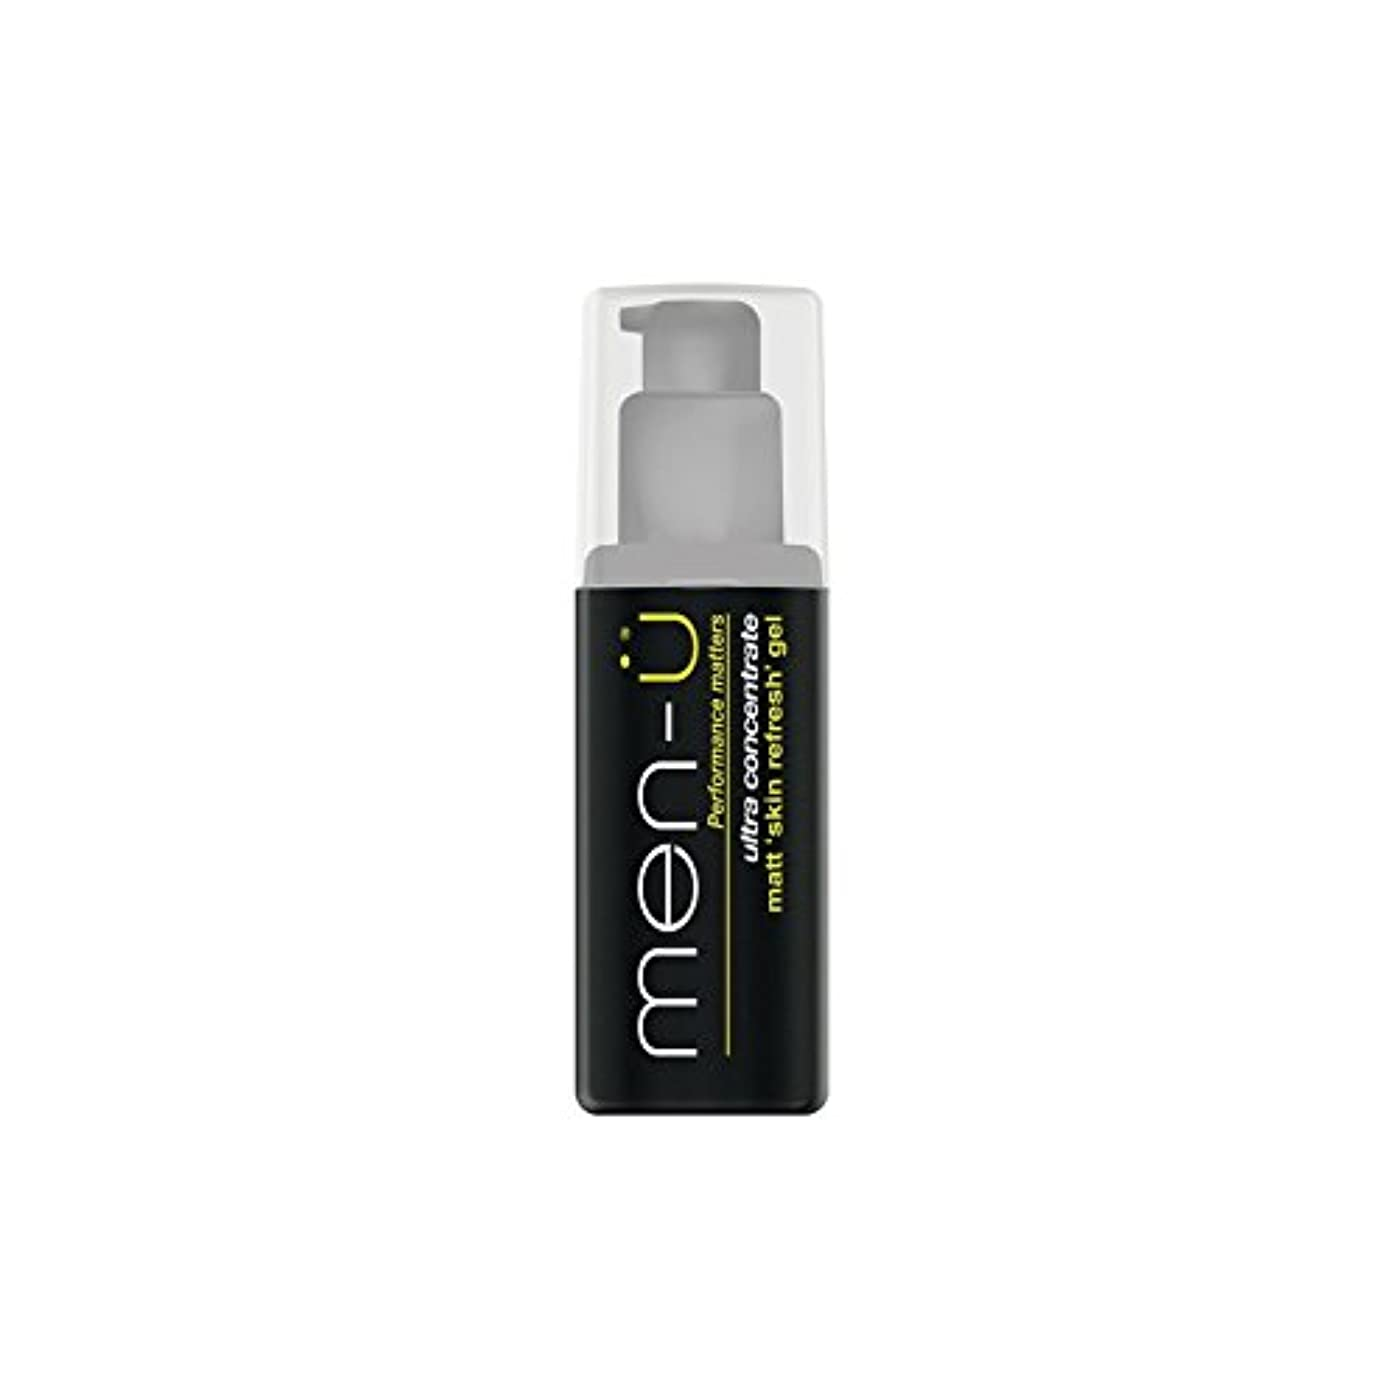 Men-? Matt Skin Refresh Gel (100ml) (Pack of 6) - 男性-?マット肌のリフレッシュジェル(100)に x6 [並行輸入品]